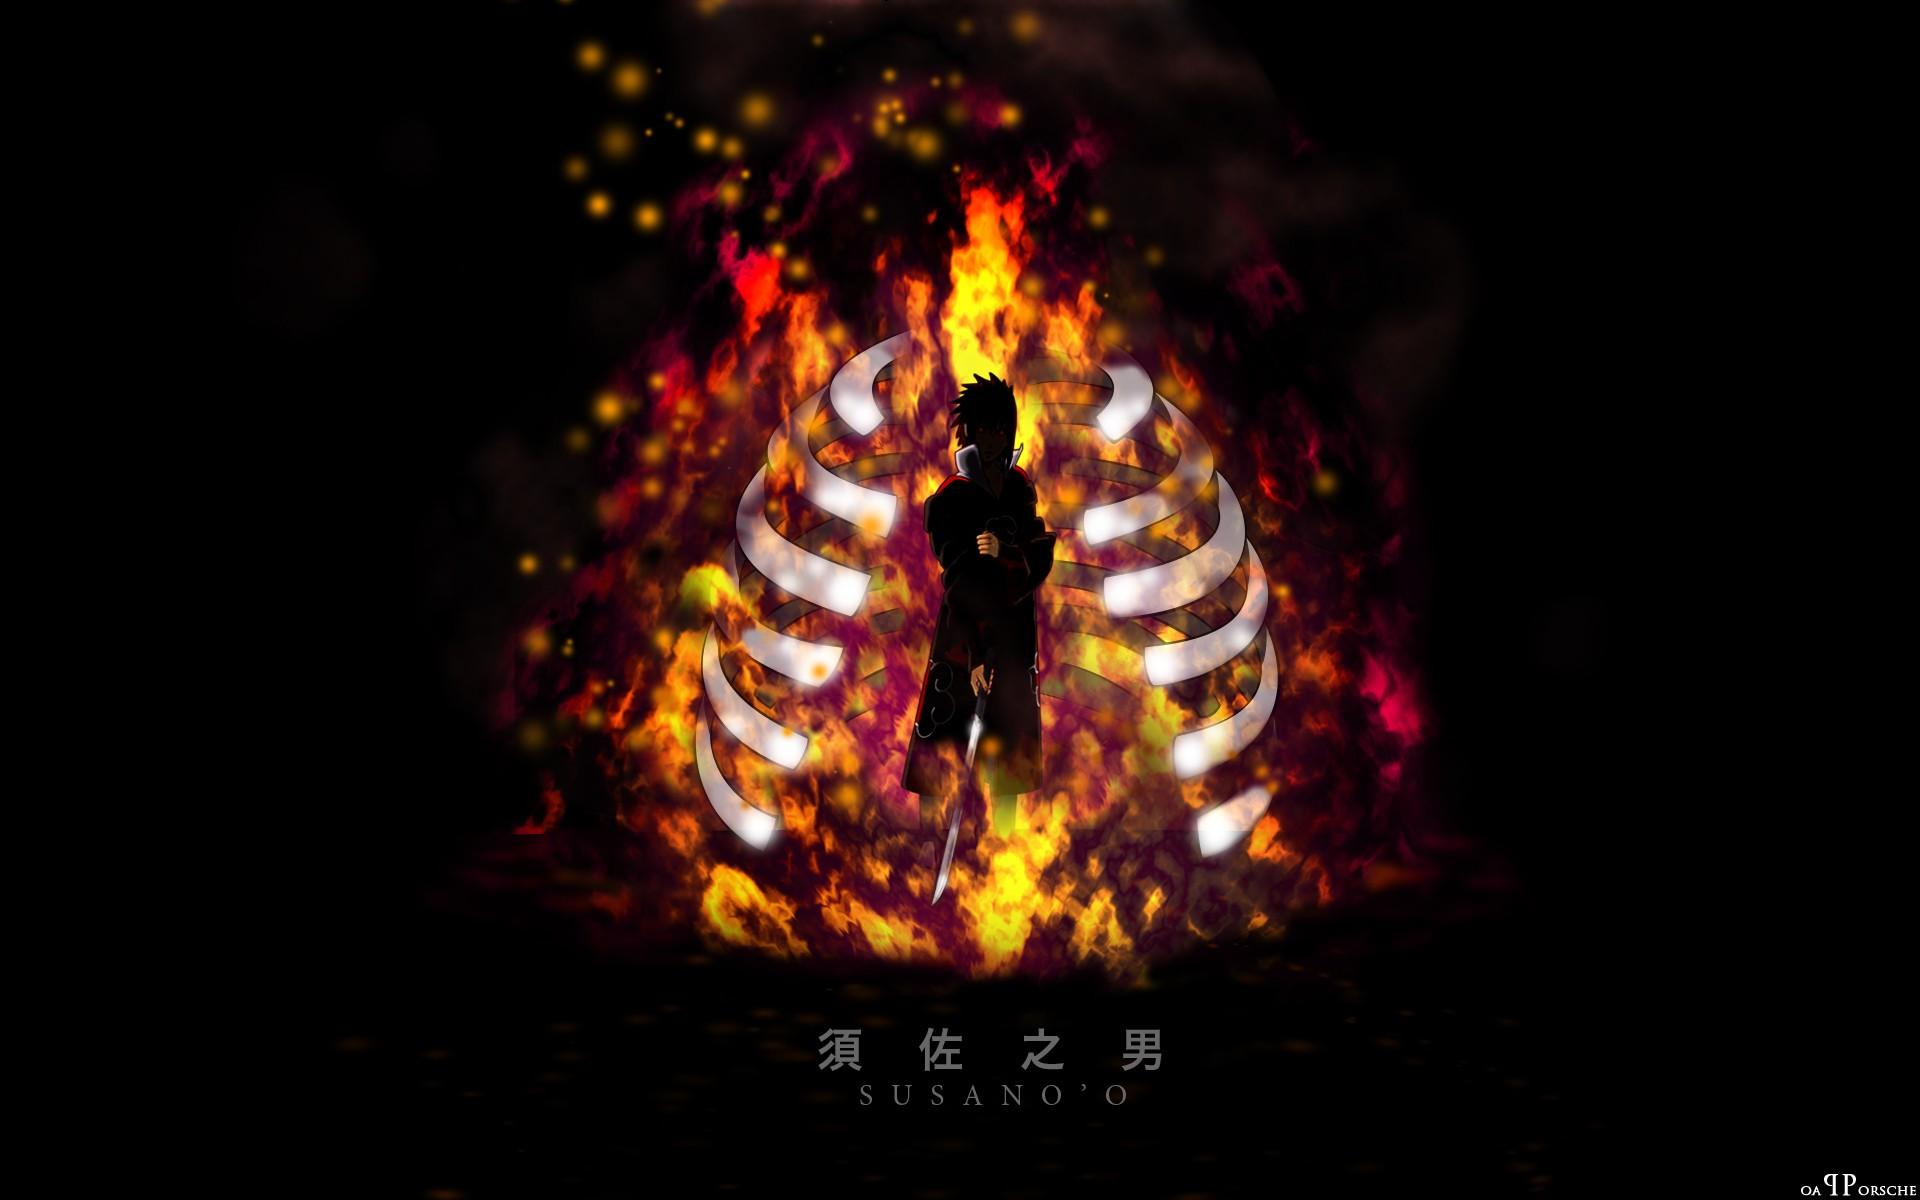 anime fire Naruto Shippuuden Uchiha Sasuke campfire flame darkness font 48306